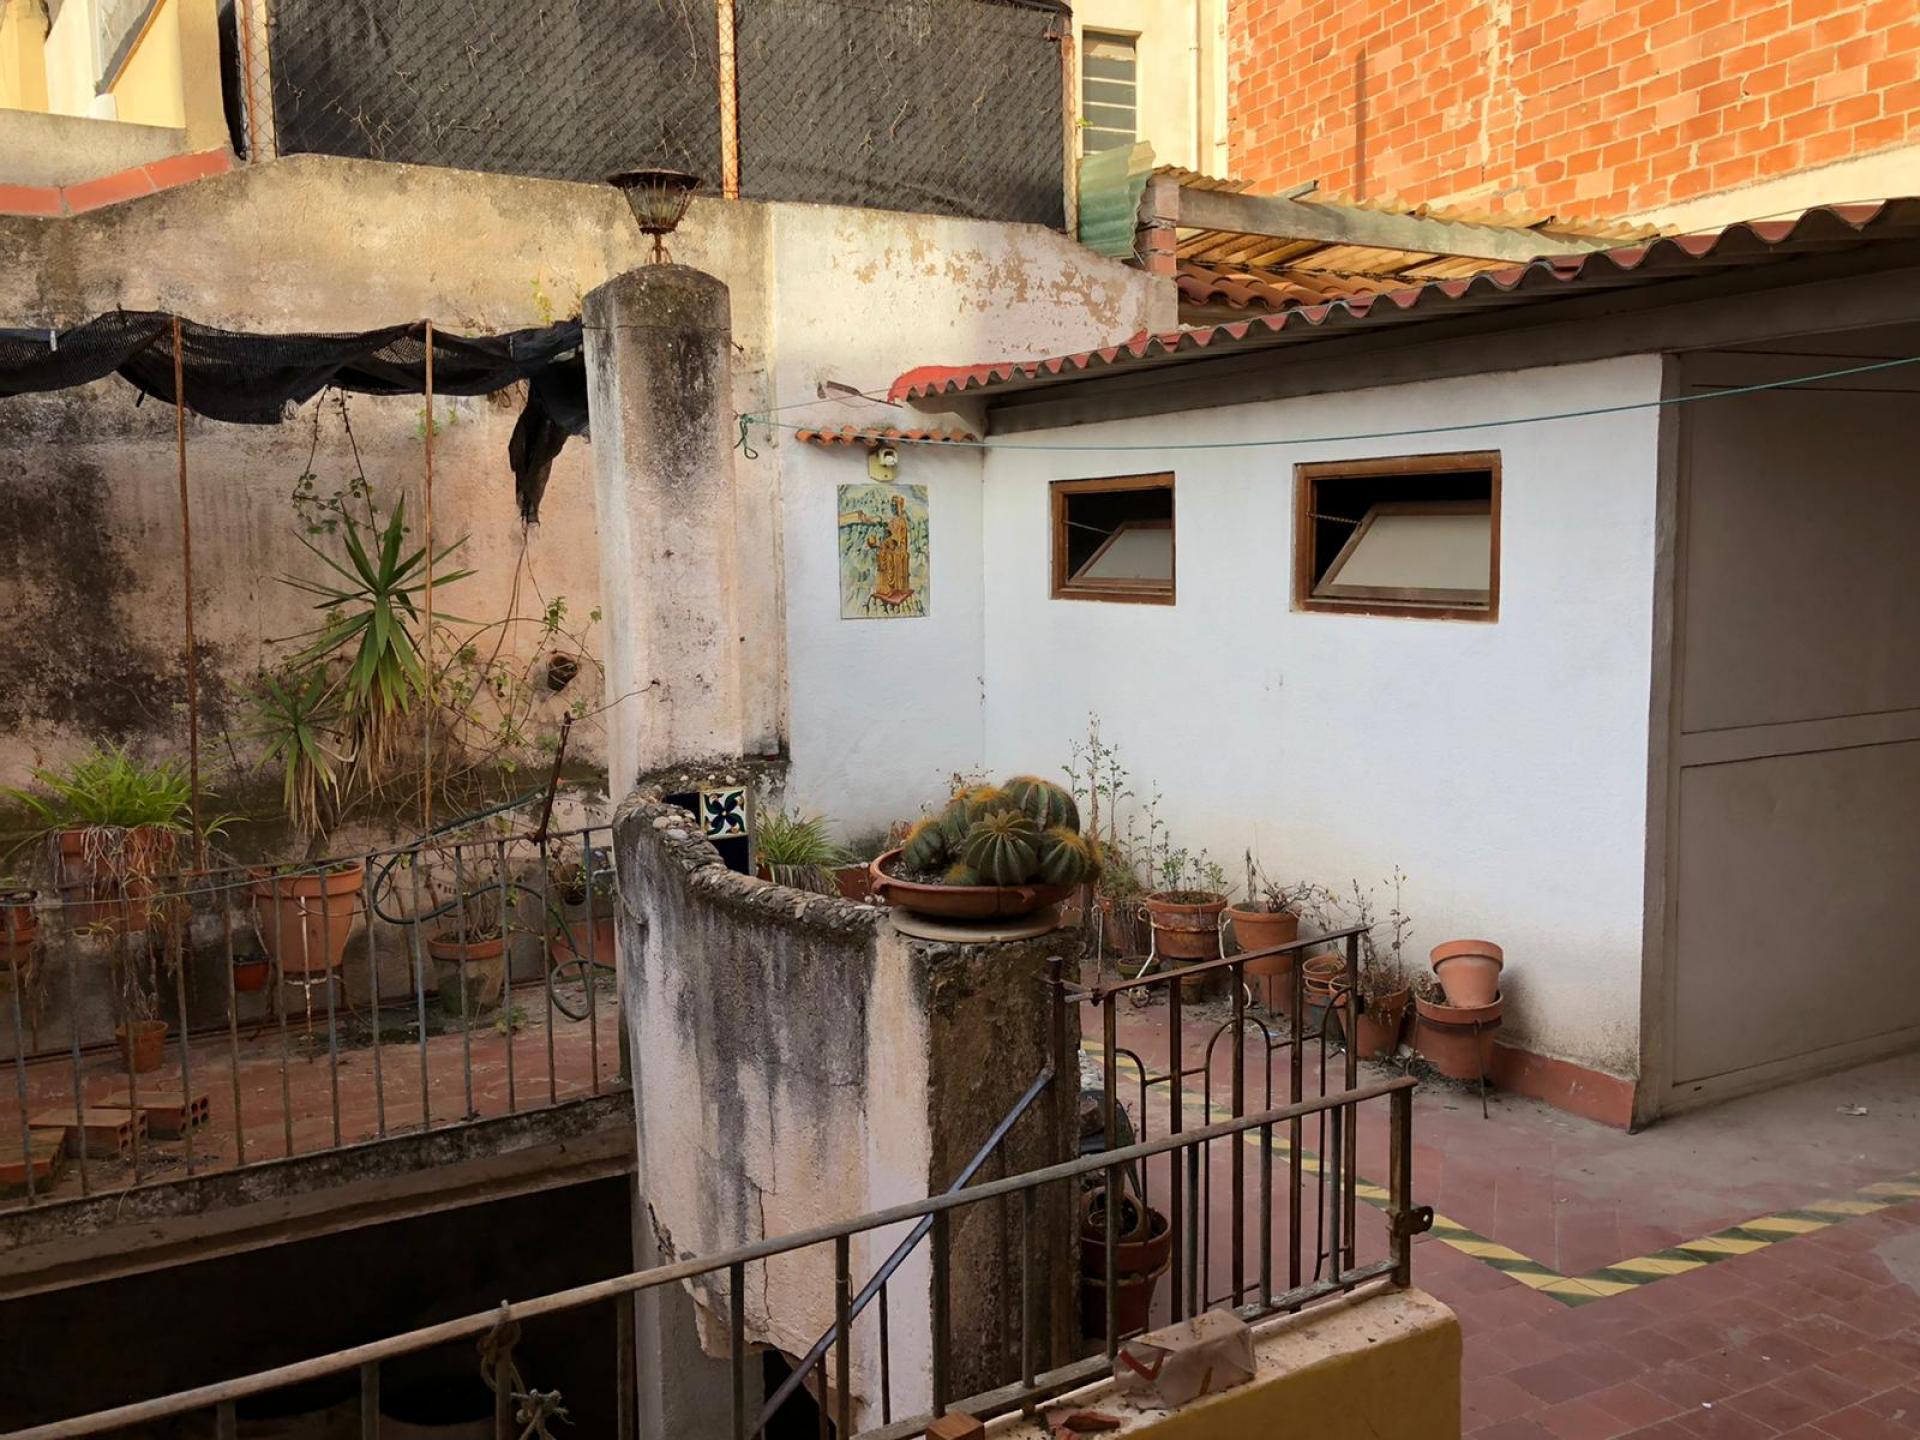 Foto 1 (V-727-2021) - Inmueble en  Venda a Sant Julià, Calle oriol , 15, Vilafranca del Penedès